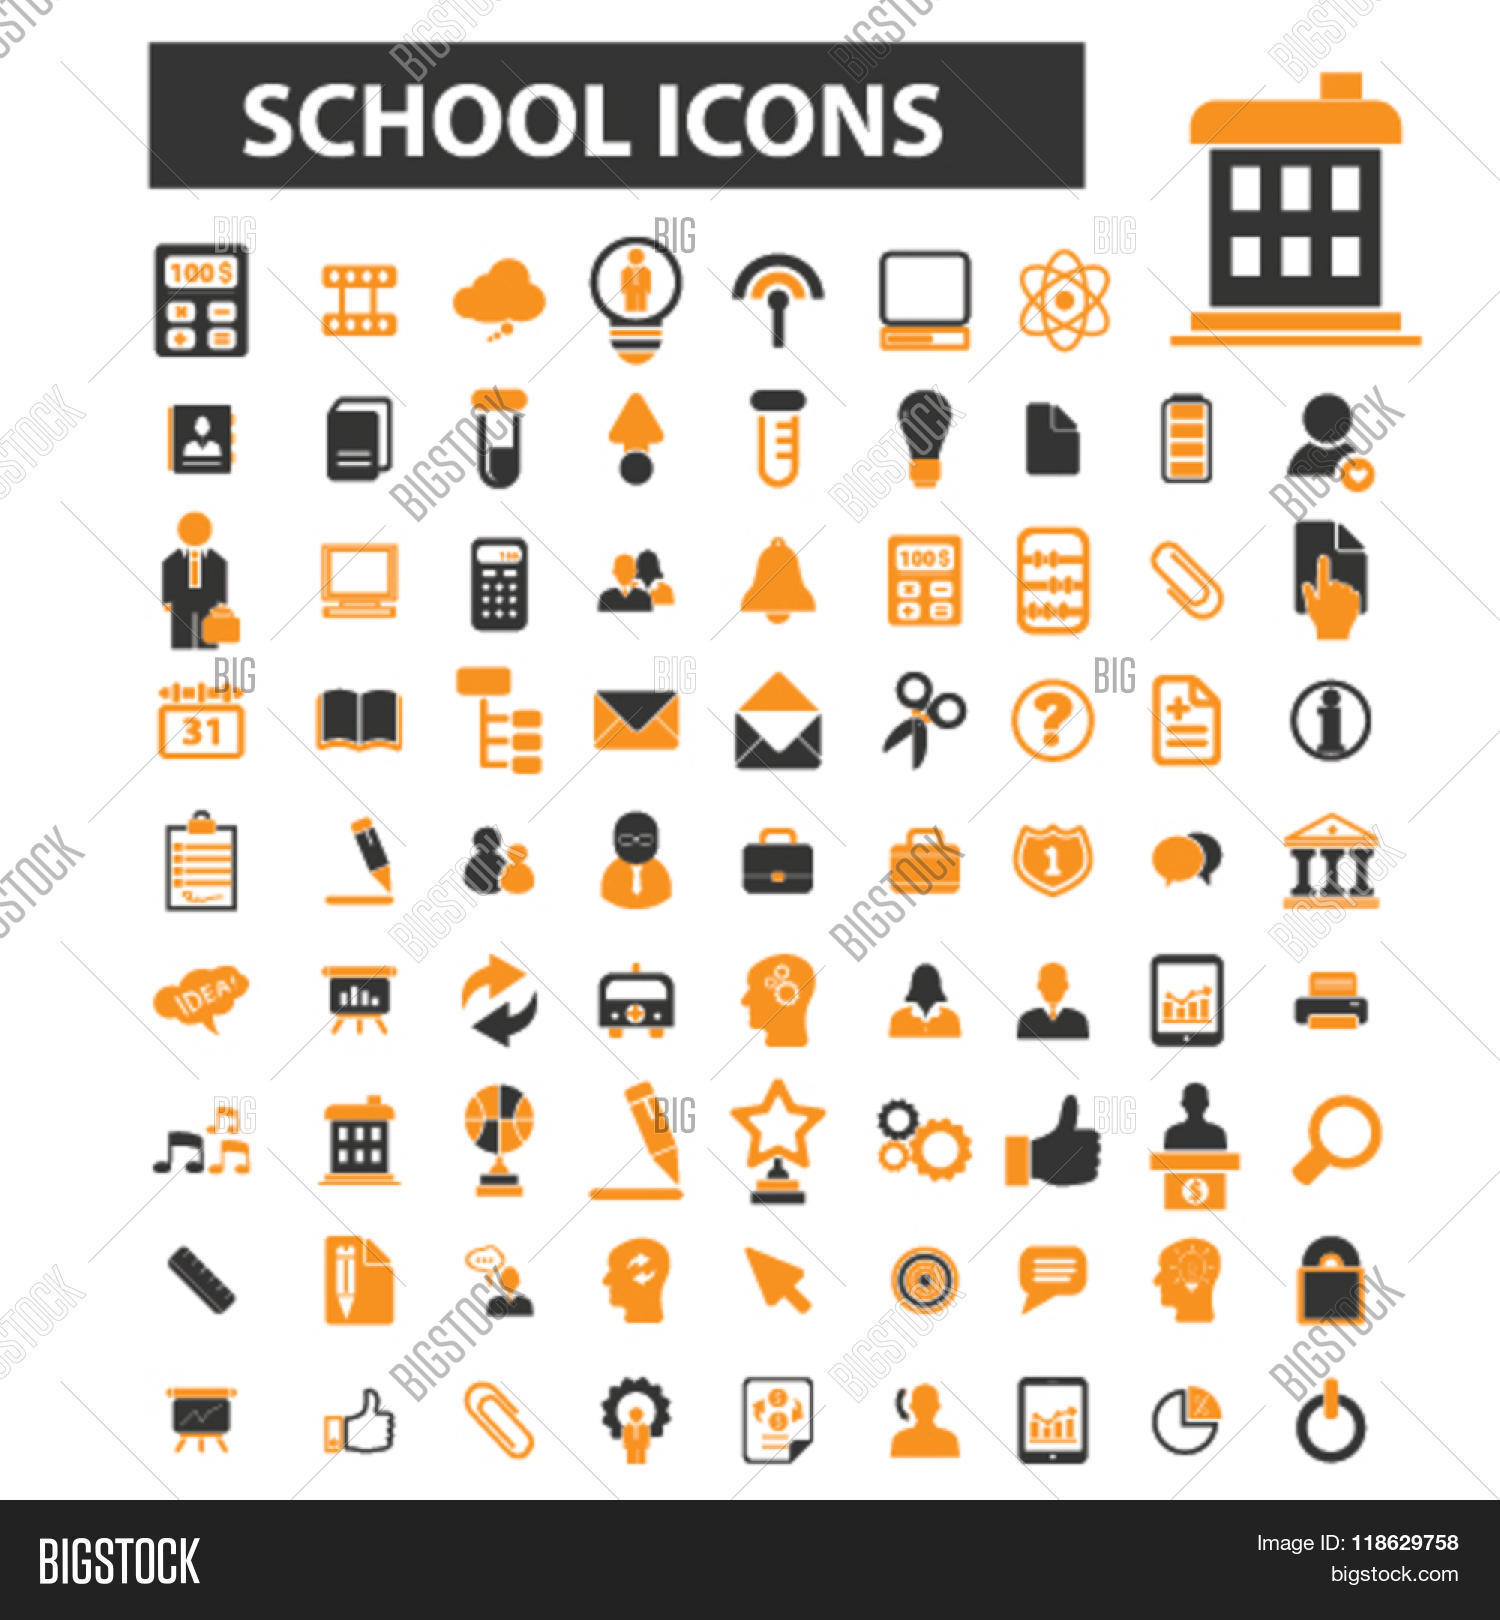 Teach icons teach logo school vector photo bigstock teach icons teach logo school icons vector school flat illustration concept school buycottarizona Image collections